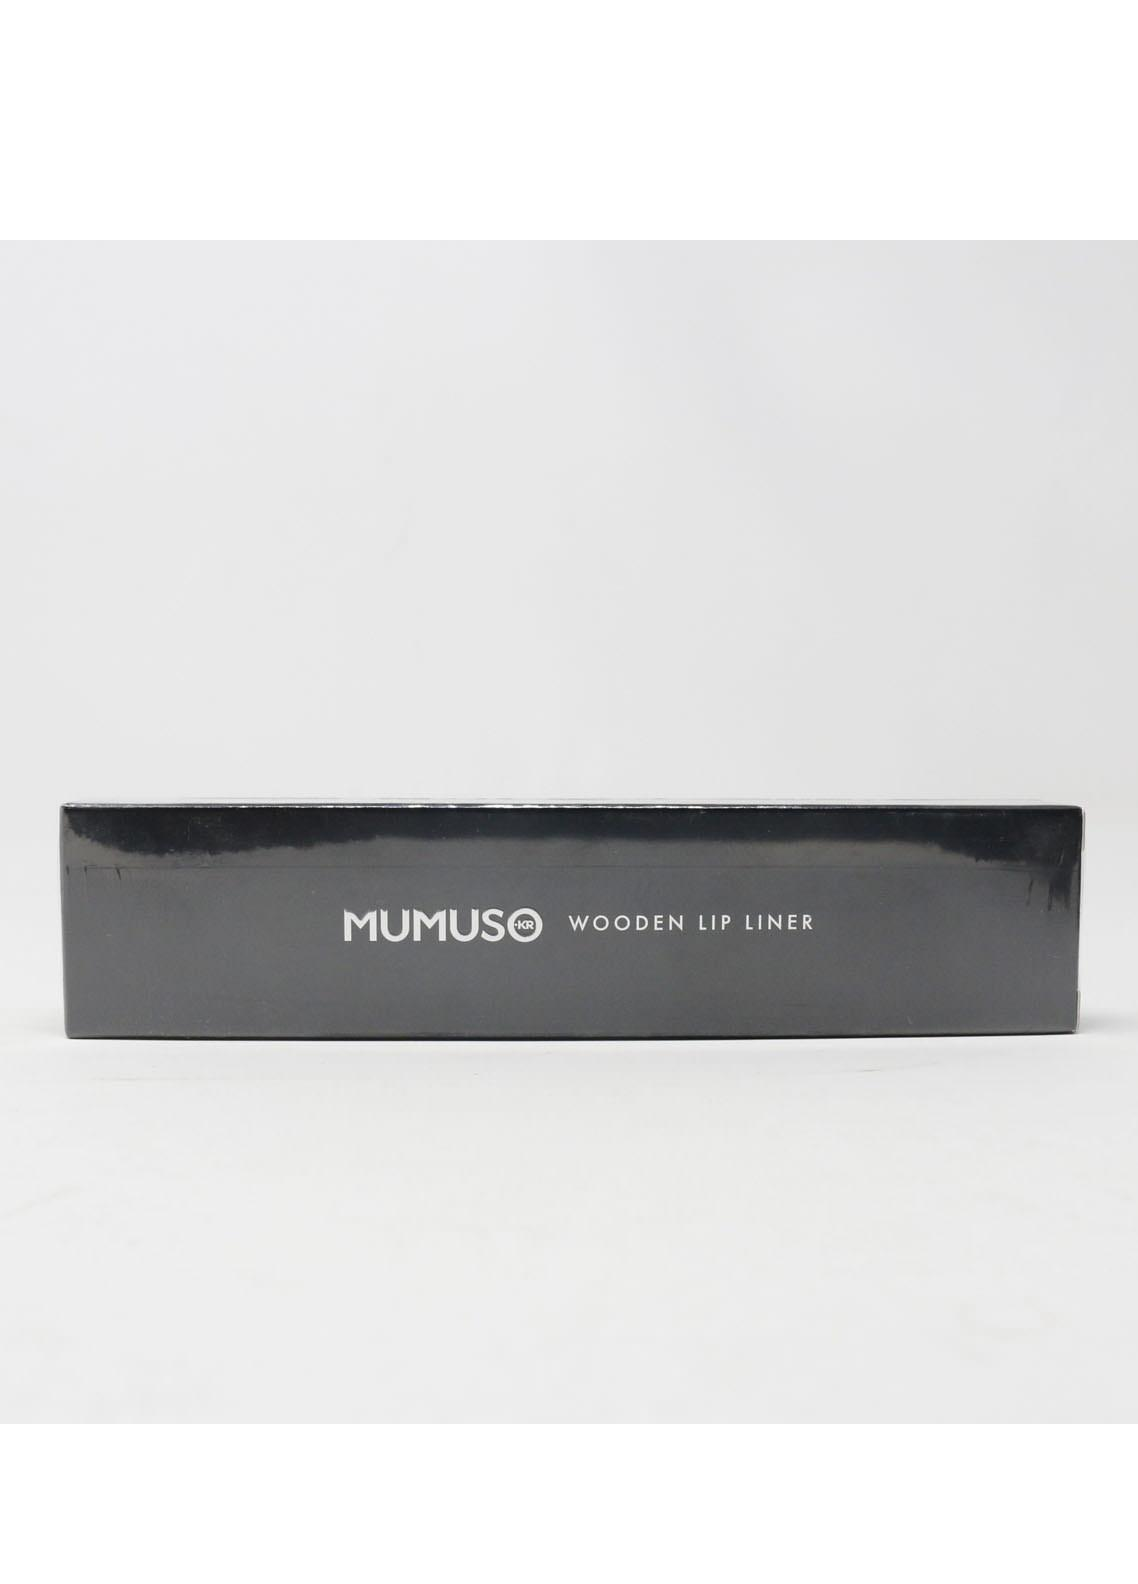 Mumuso WOODEN LIP LINER 03 LUCK FAIRY